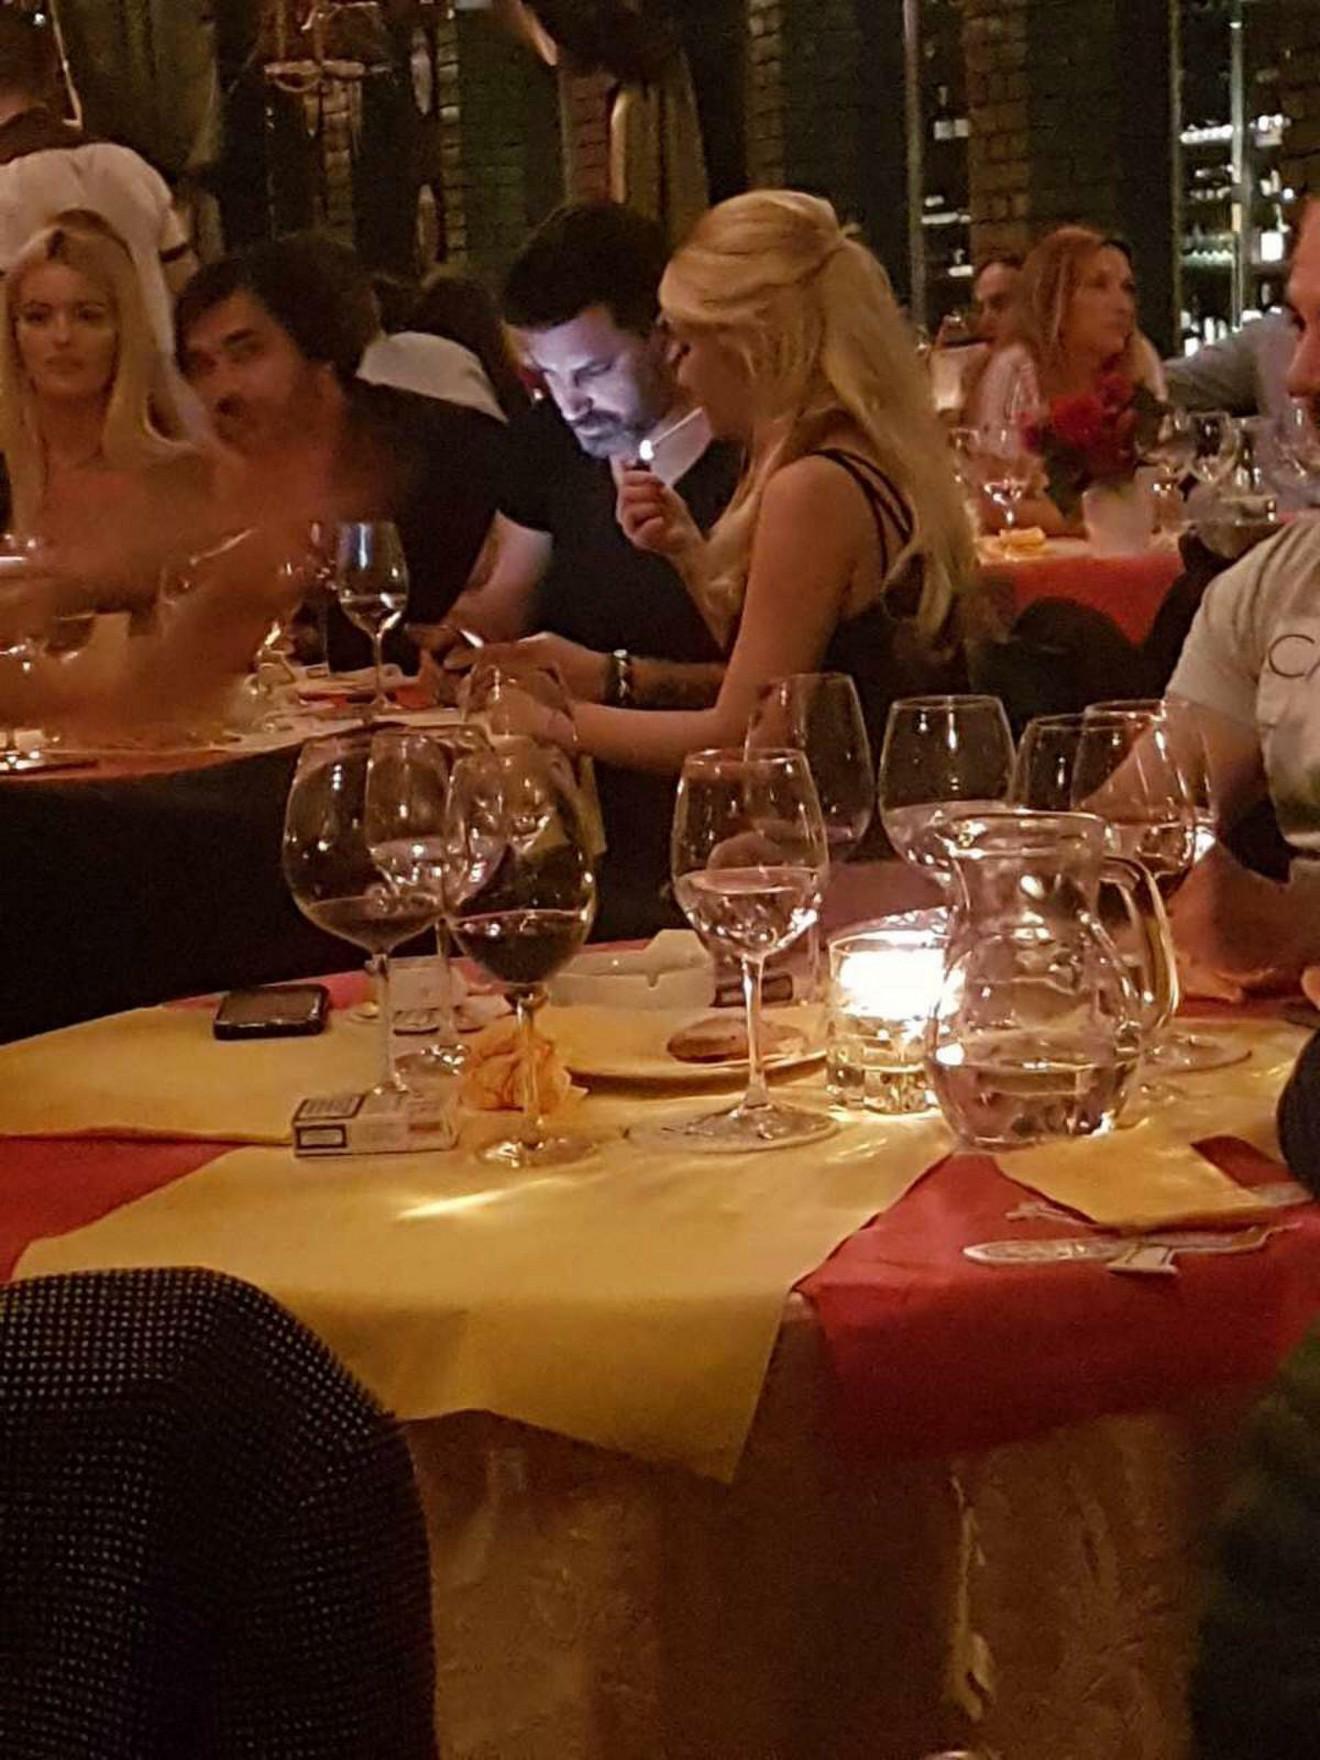 Par fotografisan tokom večere u prestoničkom restoranu